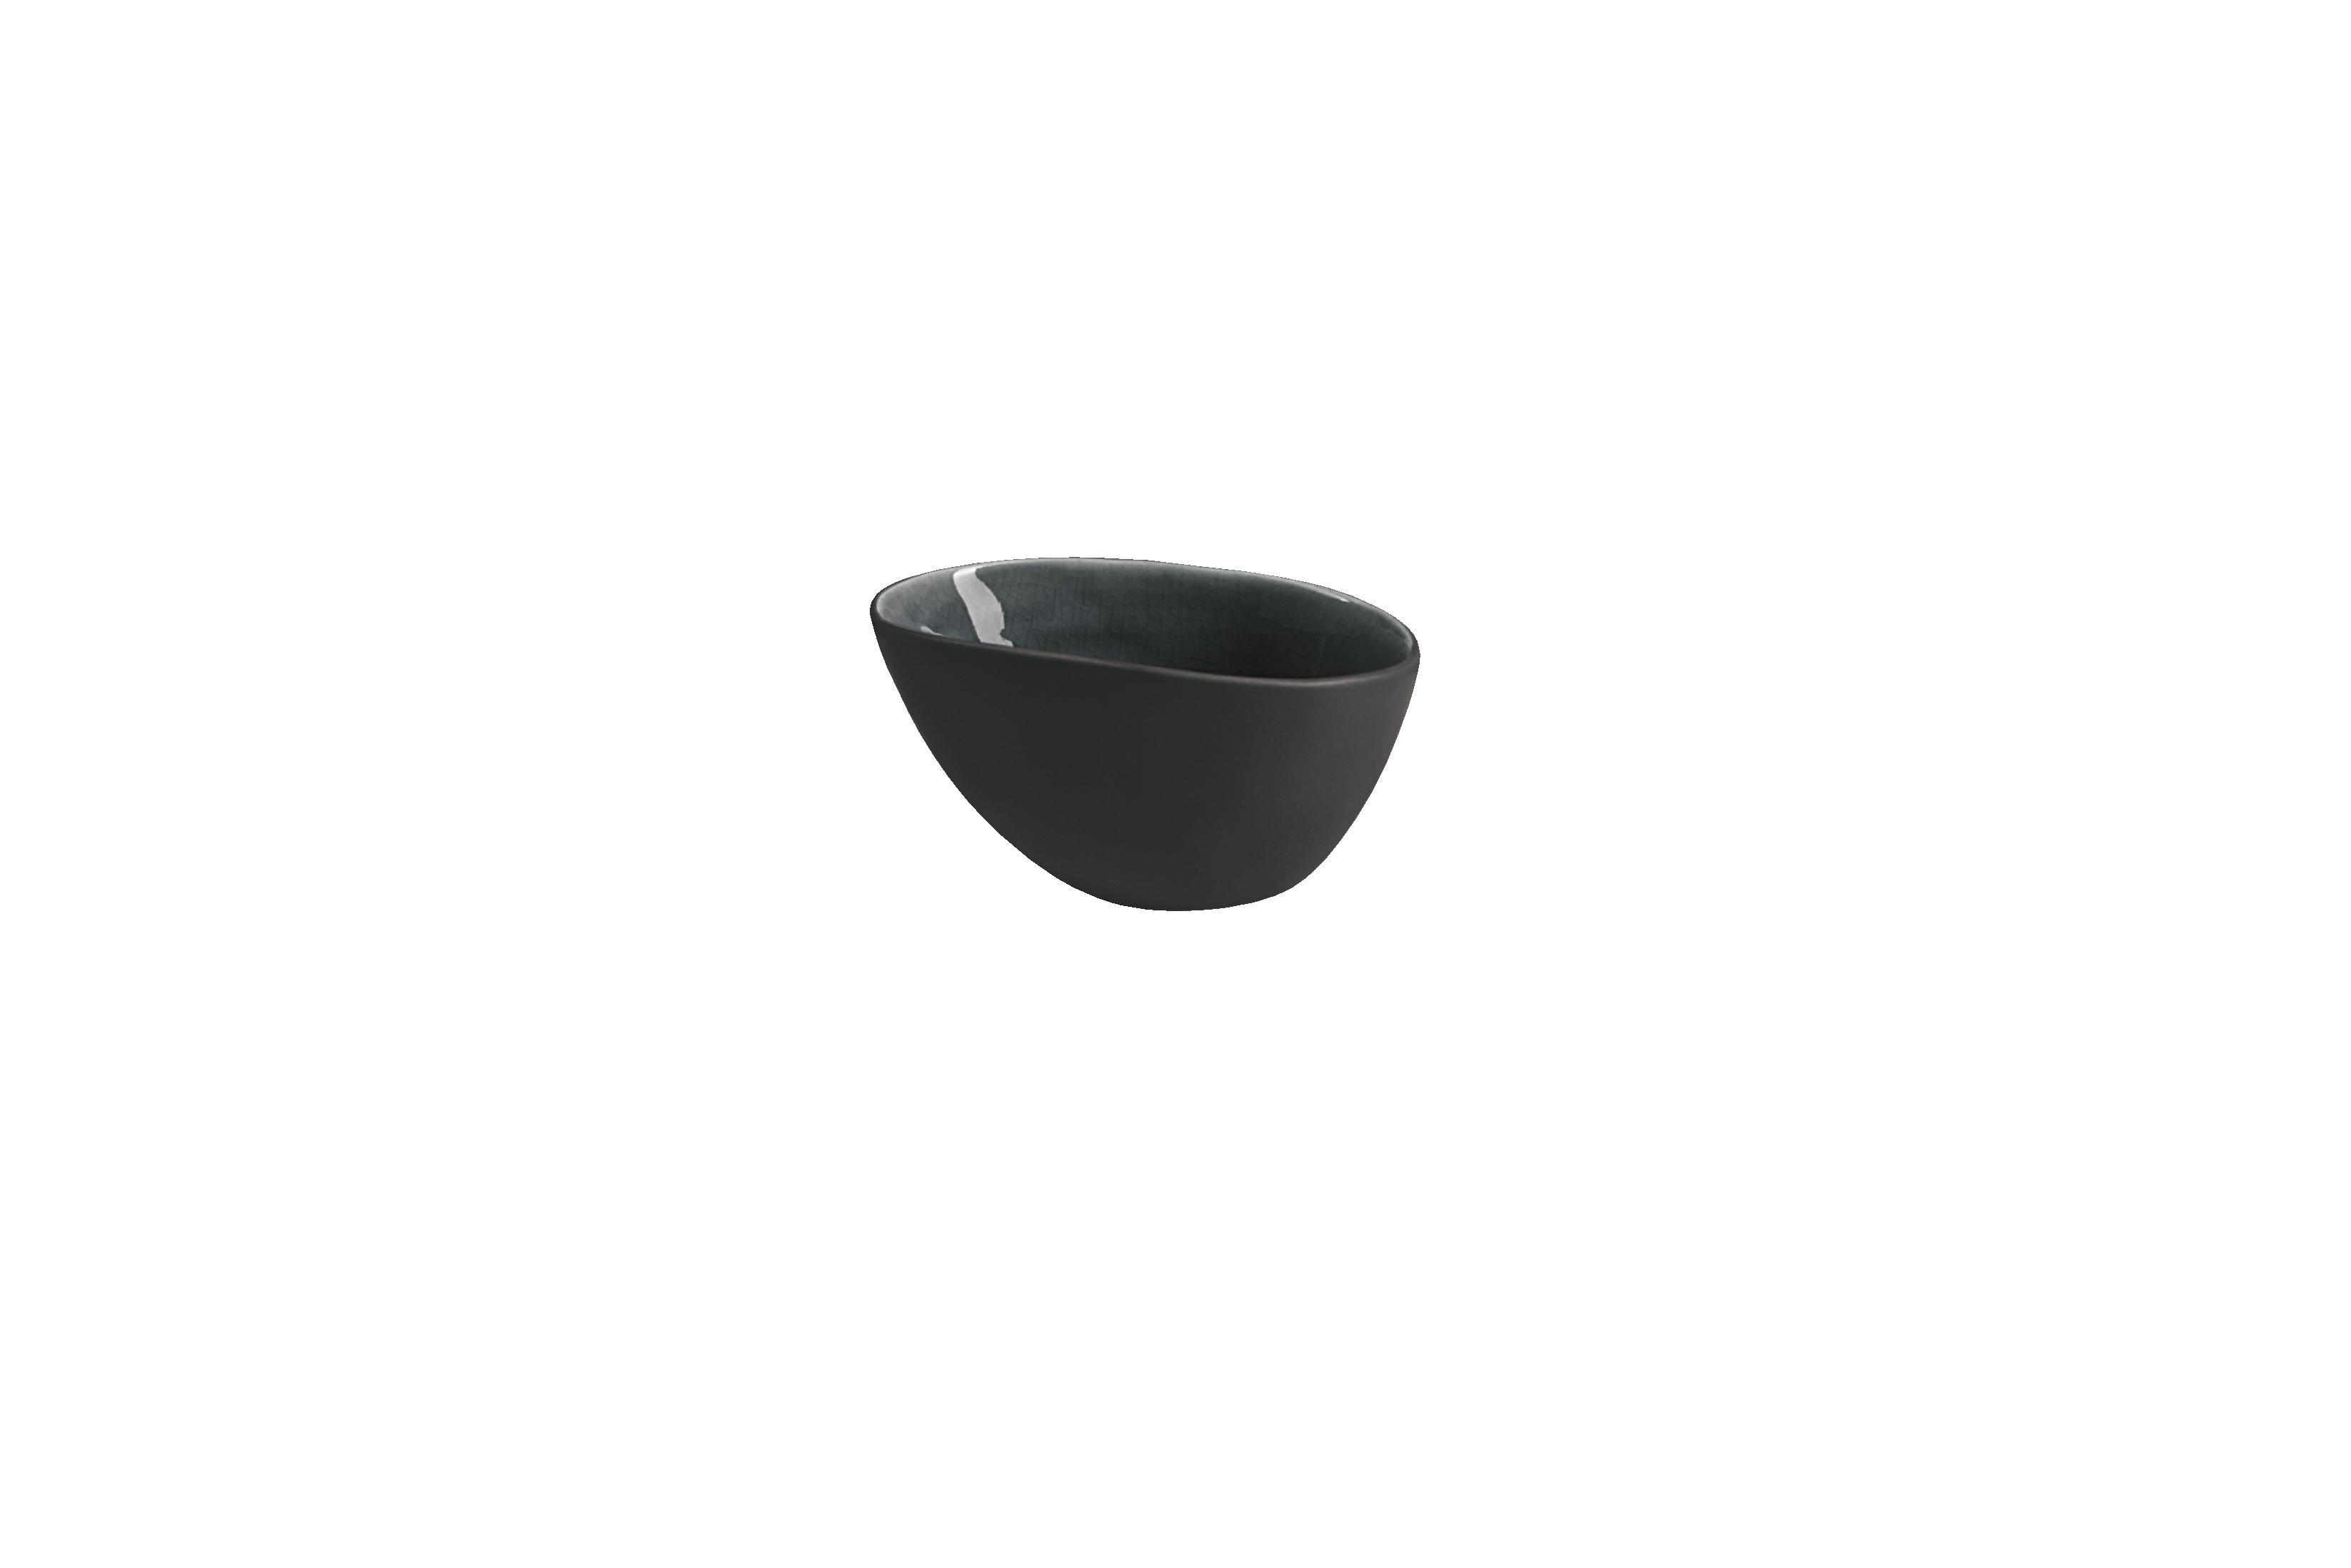 10 x 7 5 cm h 5 5 cm home by asa die asa selection wohnwelten. Black Bedroom Furniture Sets. Home Design Ideas